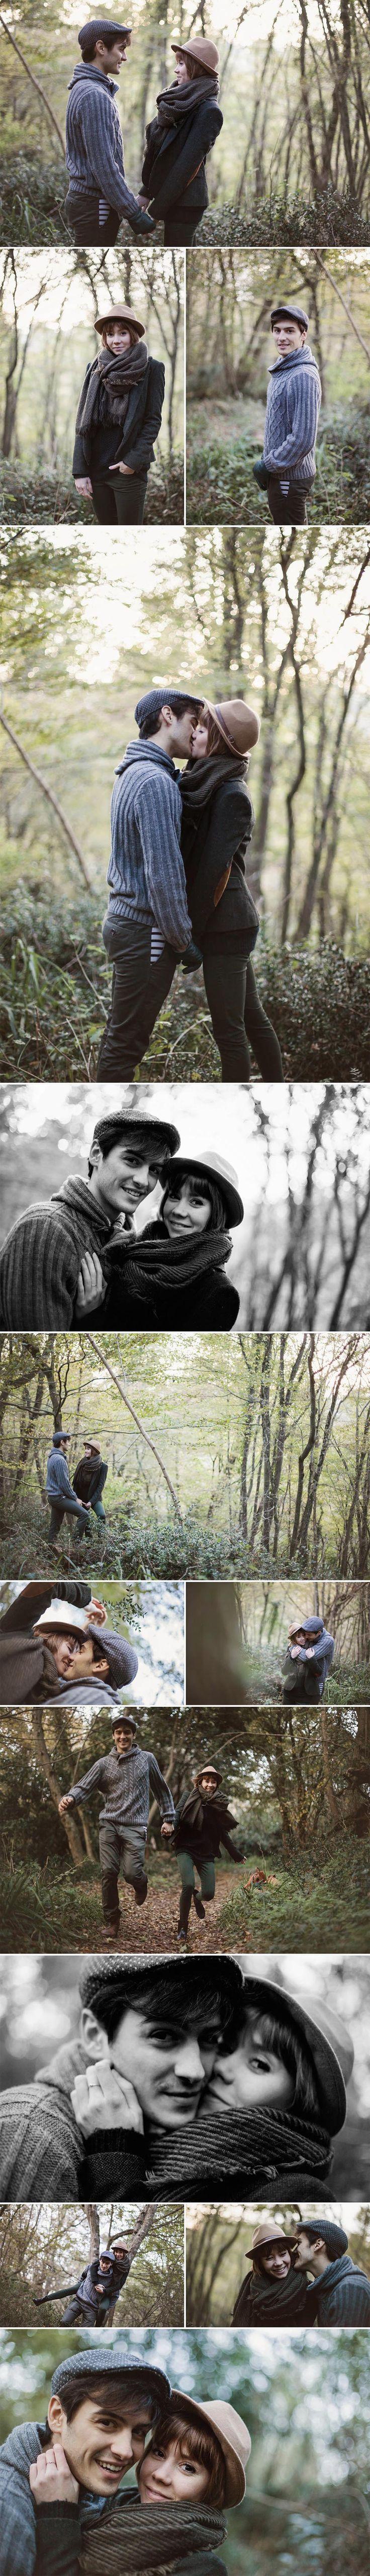 Tiffany & Julien // Séance photo couple hiver // Sarah Miramon Photographe #couple #LoveSession #hiver #foret #lifesyle #photo #photographe #bordeaux